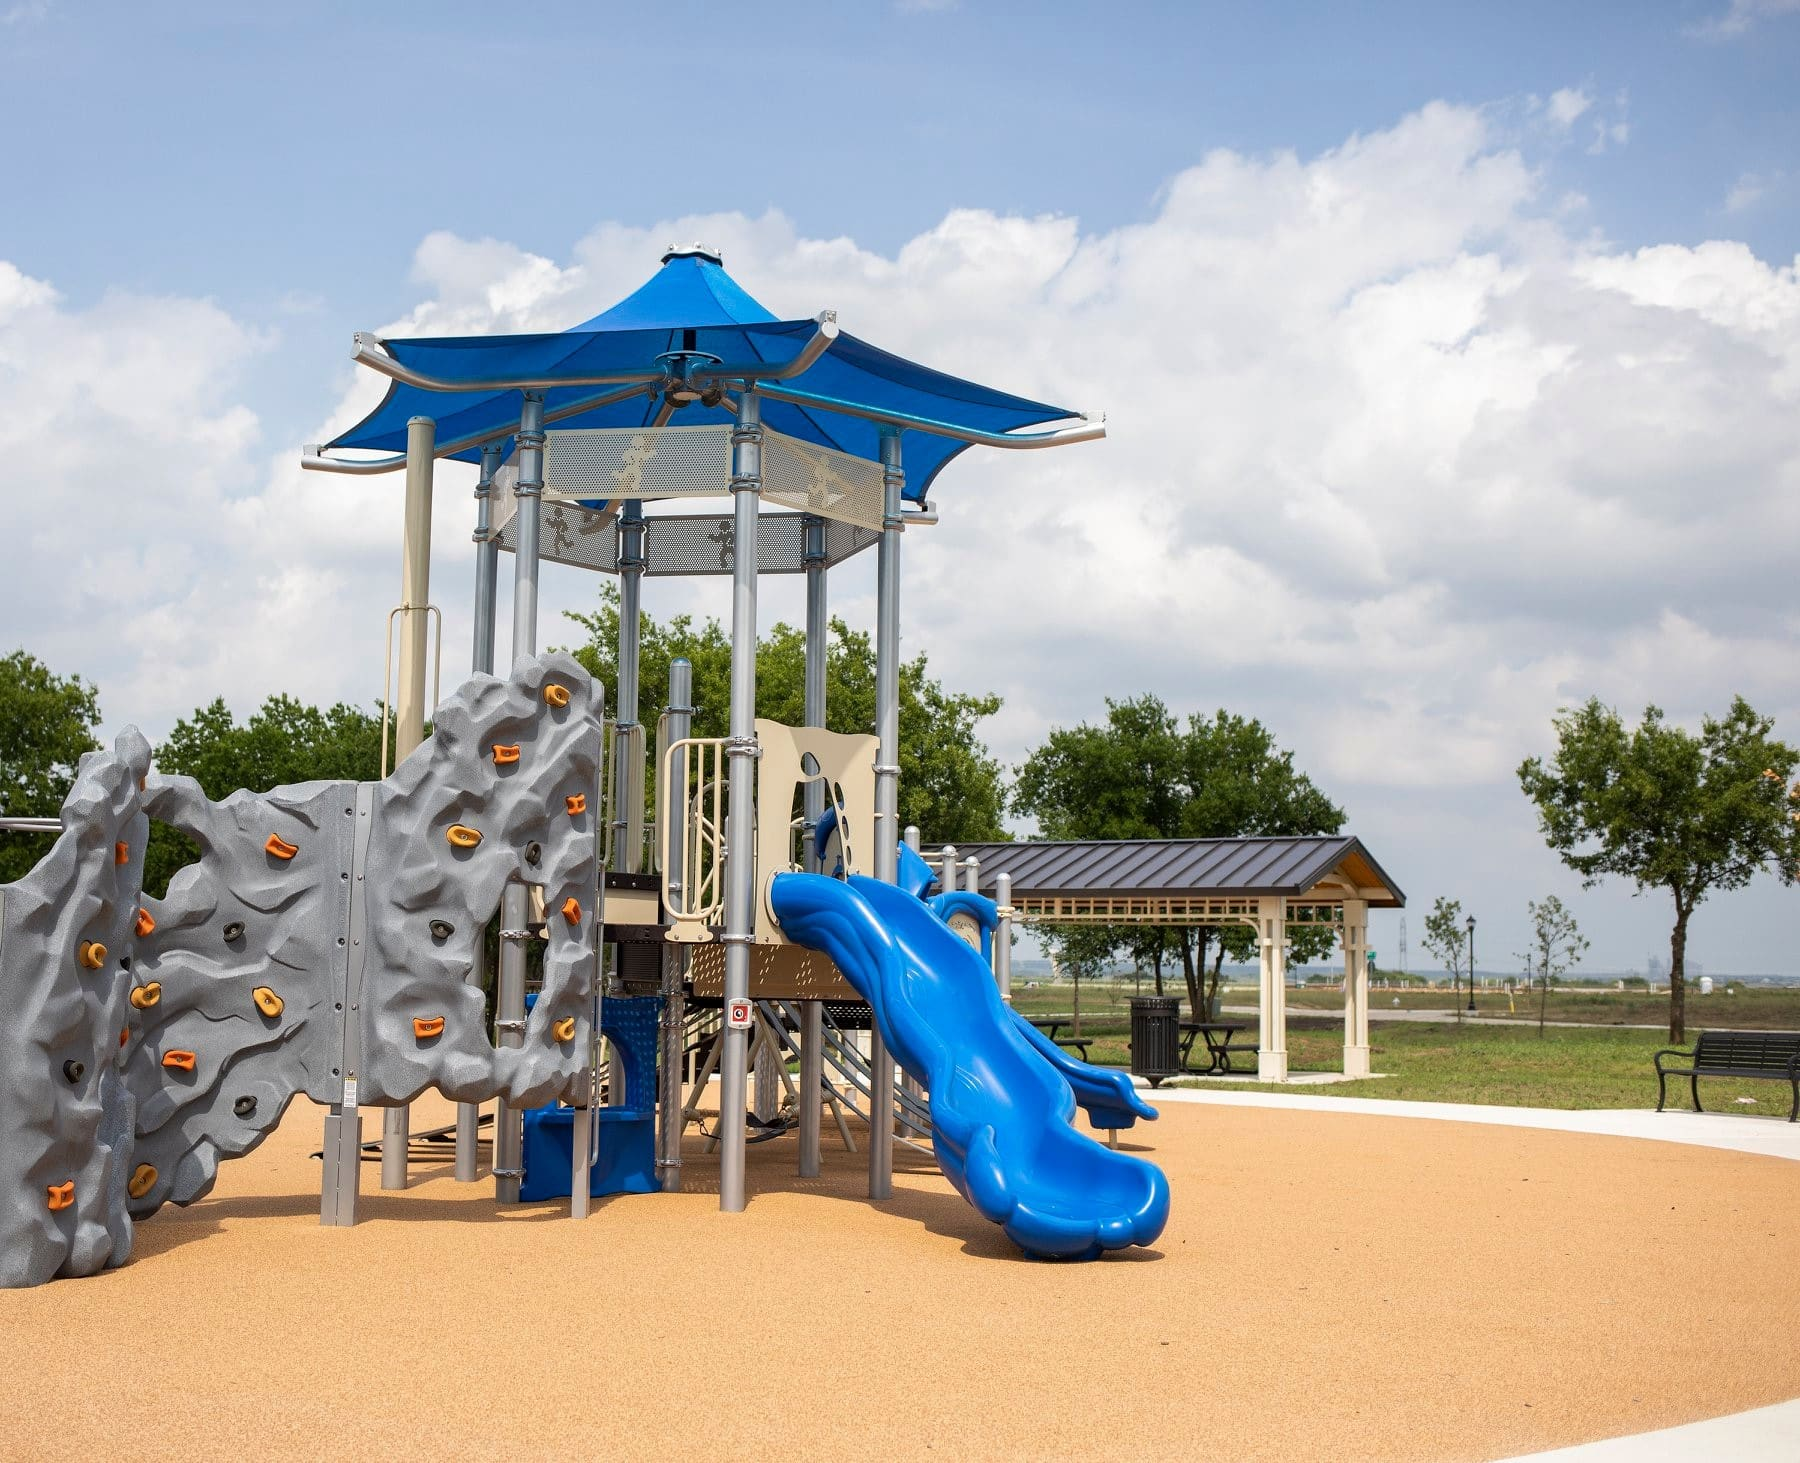 slide at Mansfield playground